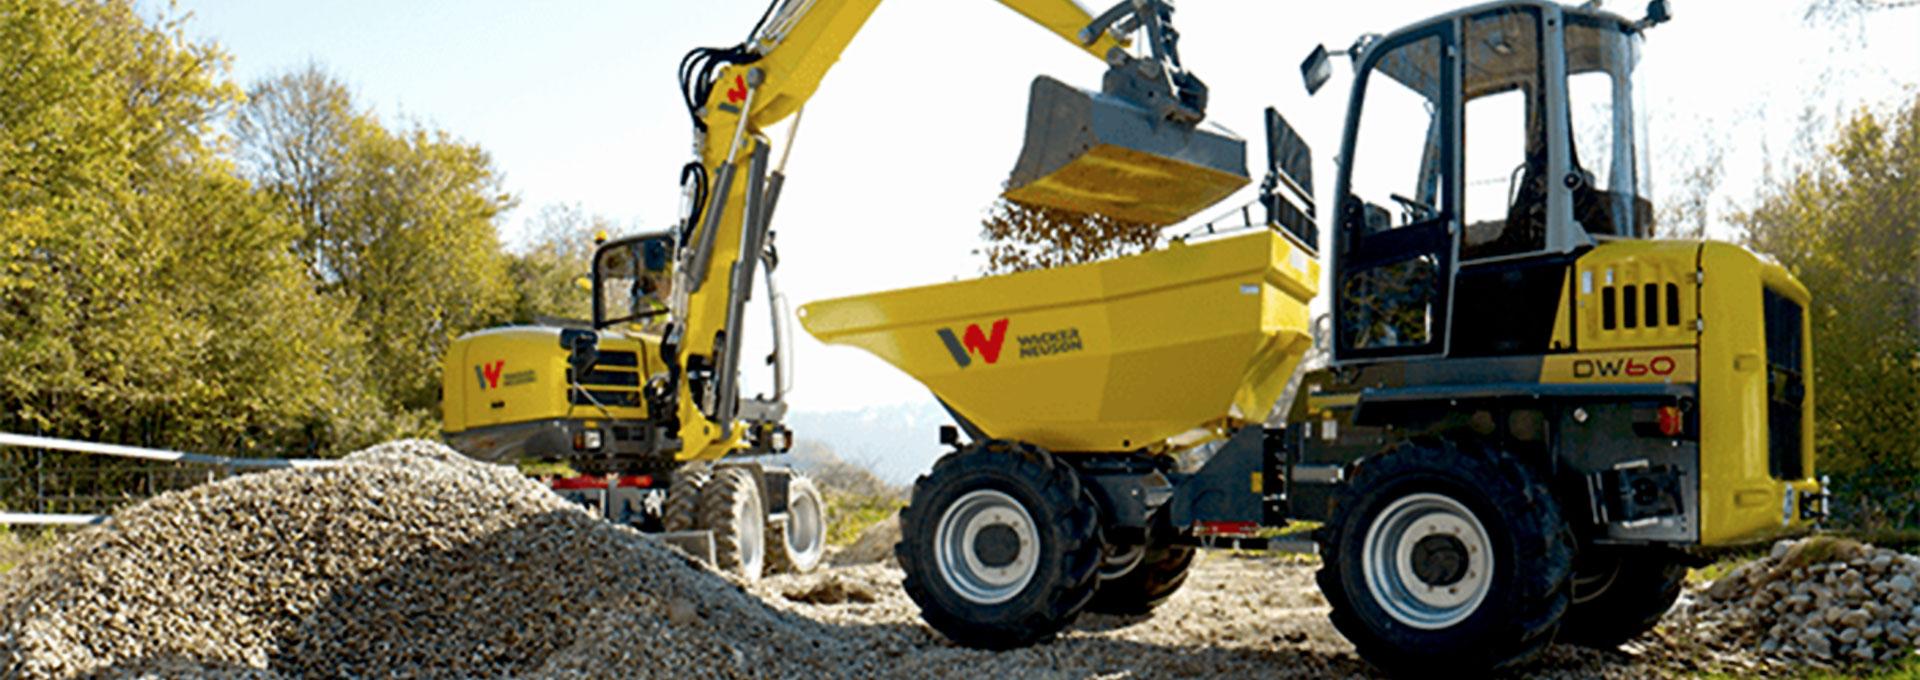 2ports maquinaria Wacker Neuson